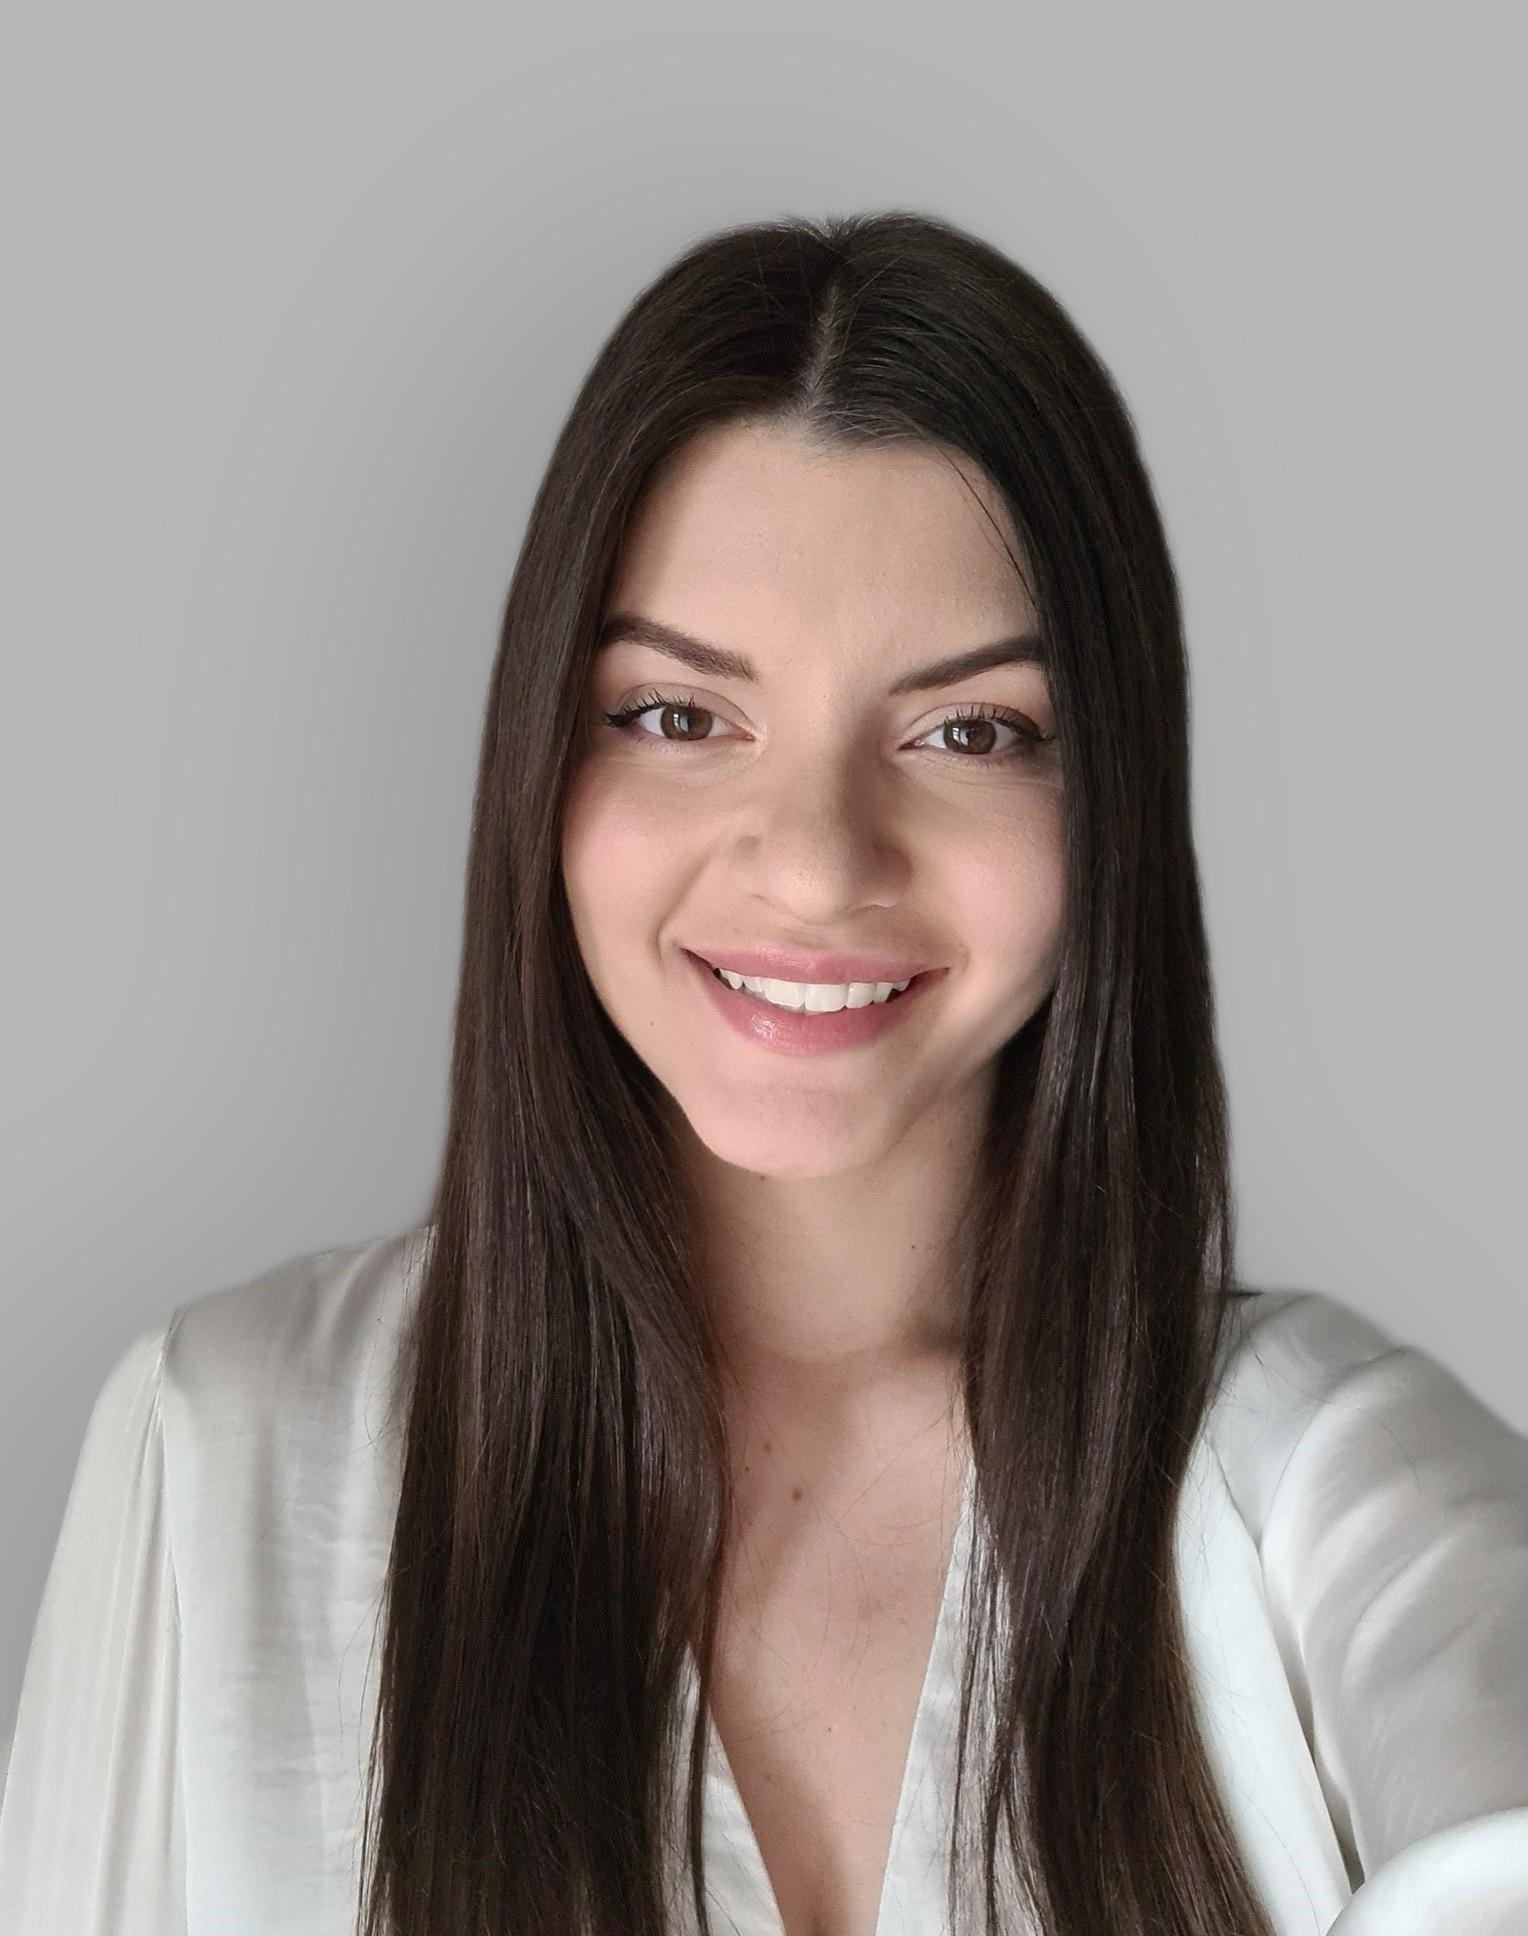 Nataliya Kitevska, Villawood, NSW, ORS